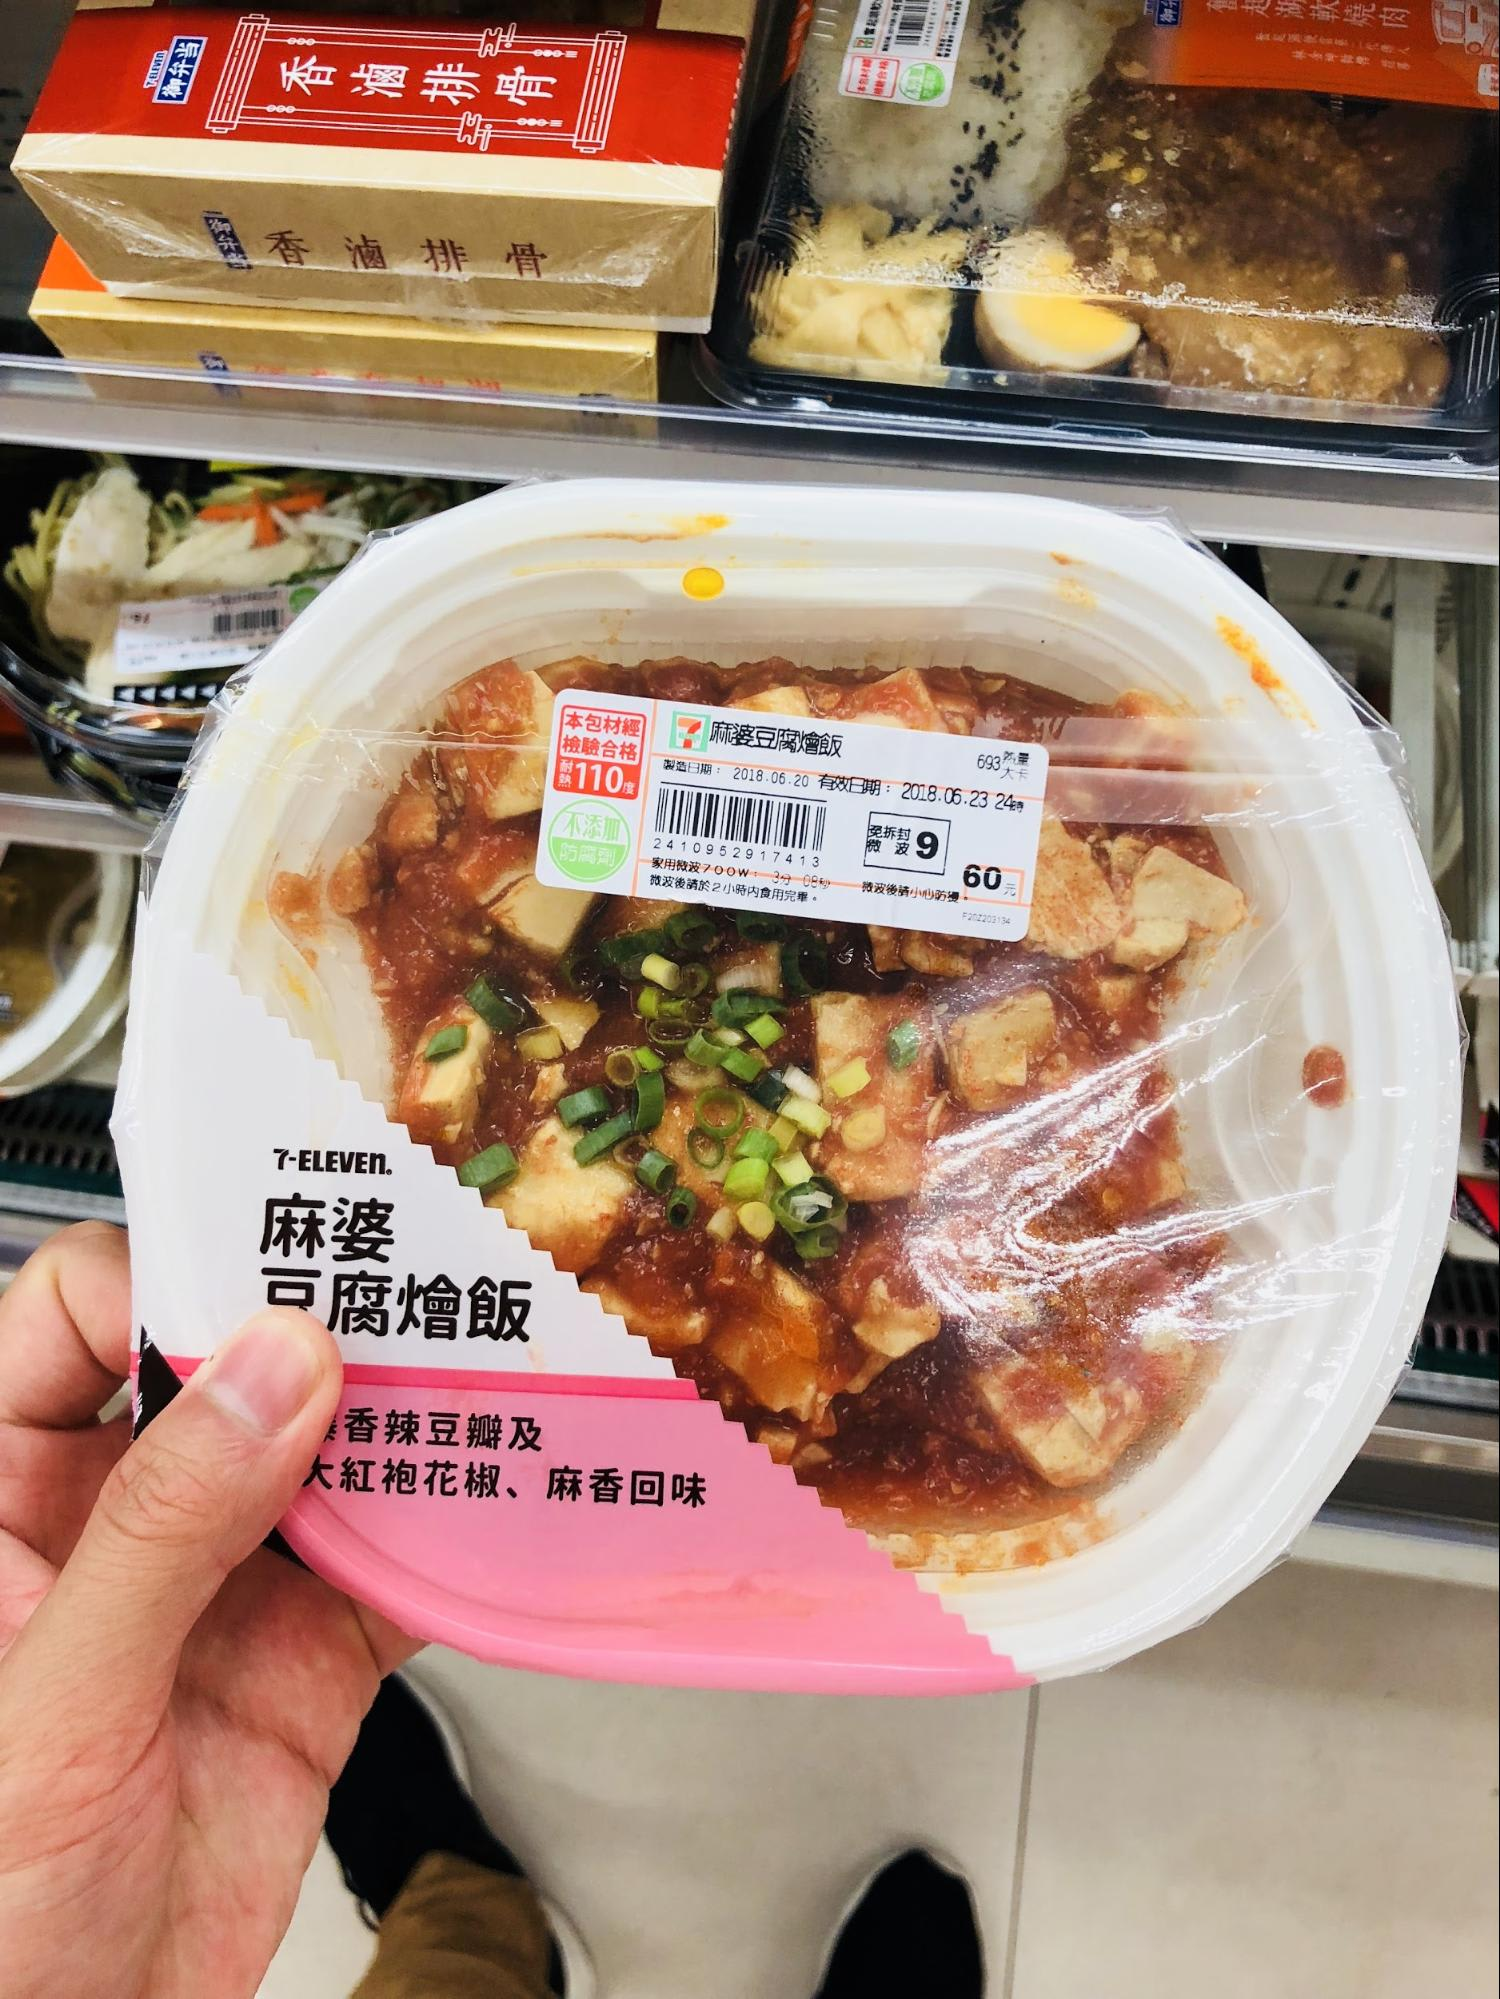 Bento Taiwan 7-Eleven